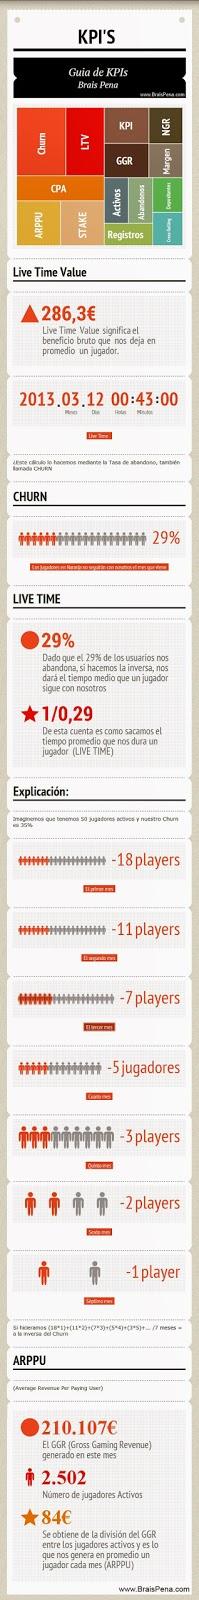 Infográfica KPIs